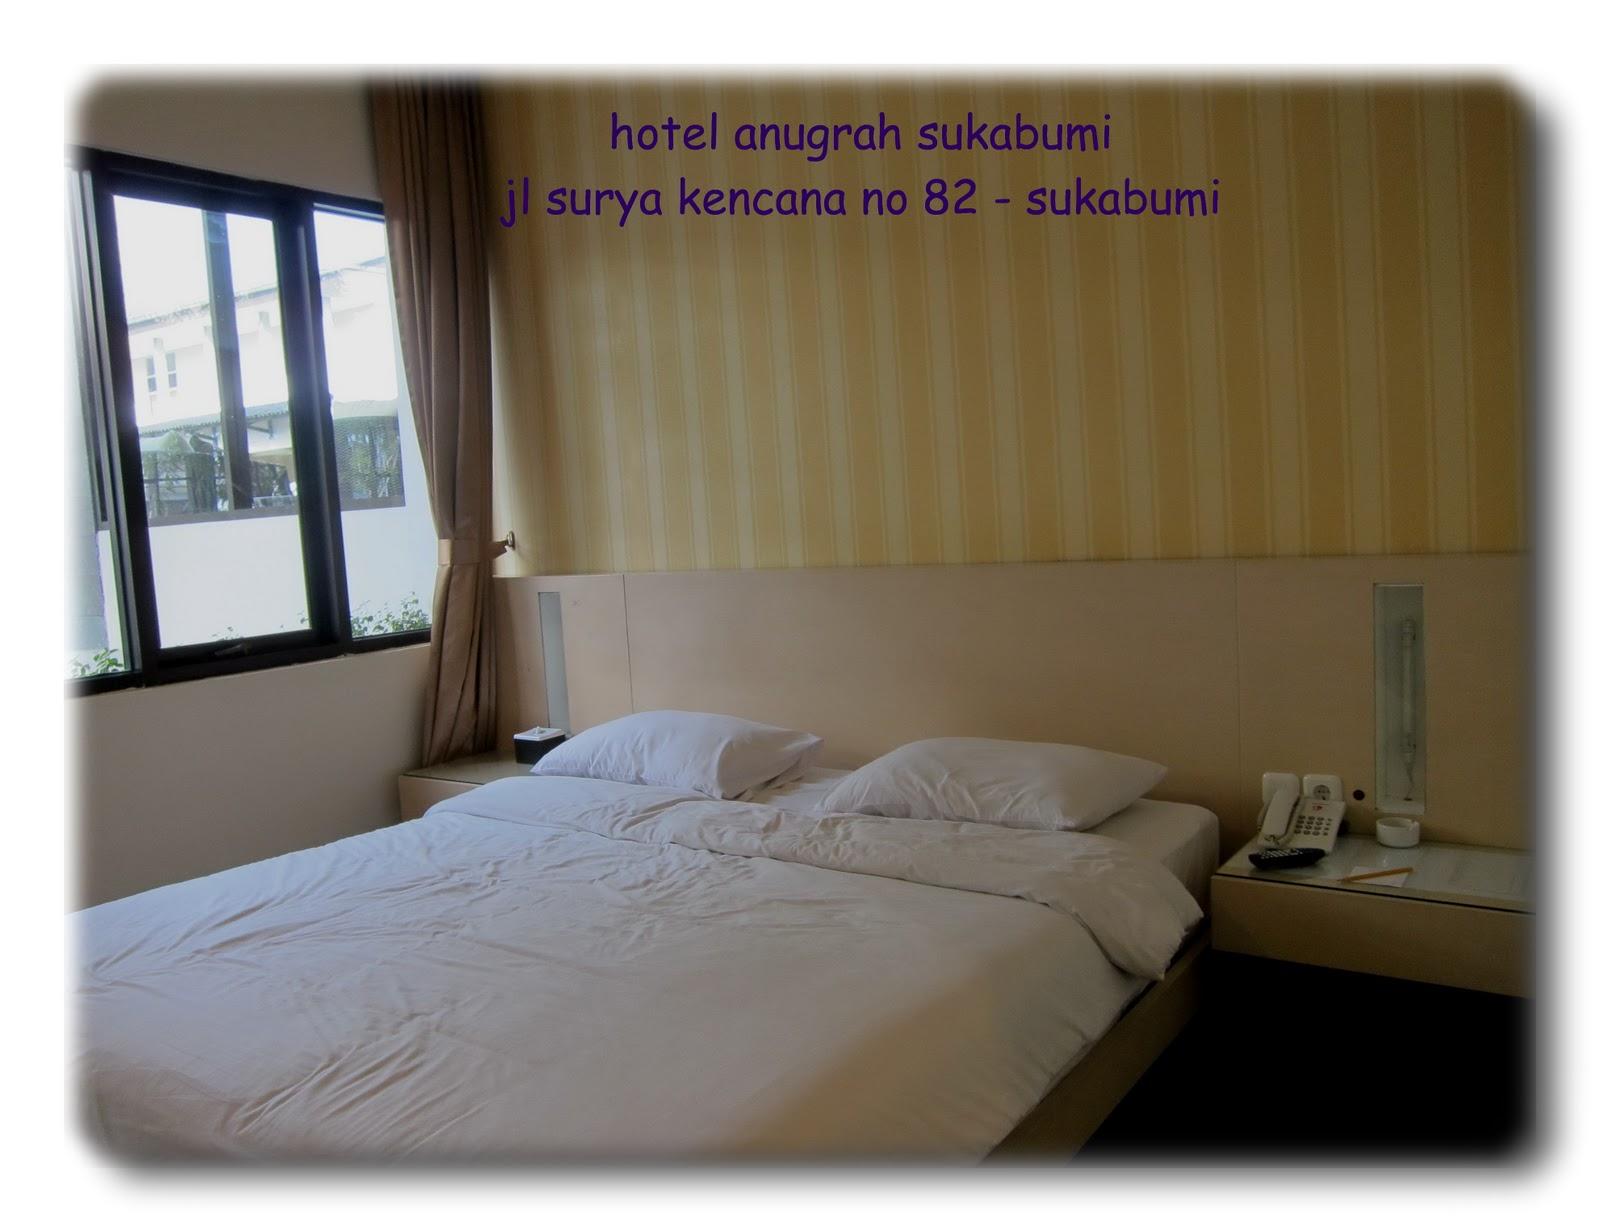 Anugrah Hotel You Are My Inspiration Chinnese New Year At Sukabumi Bandung